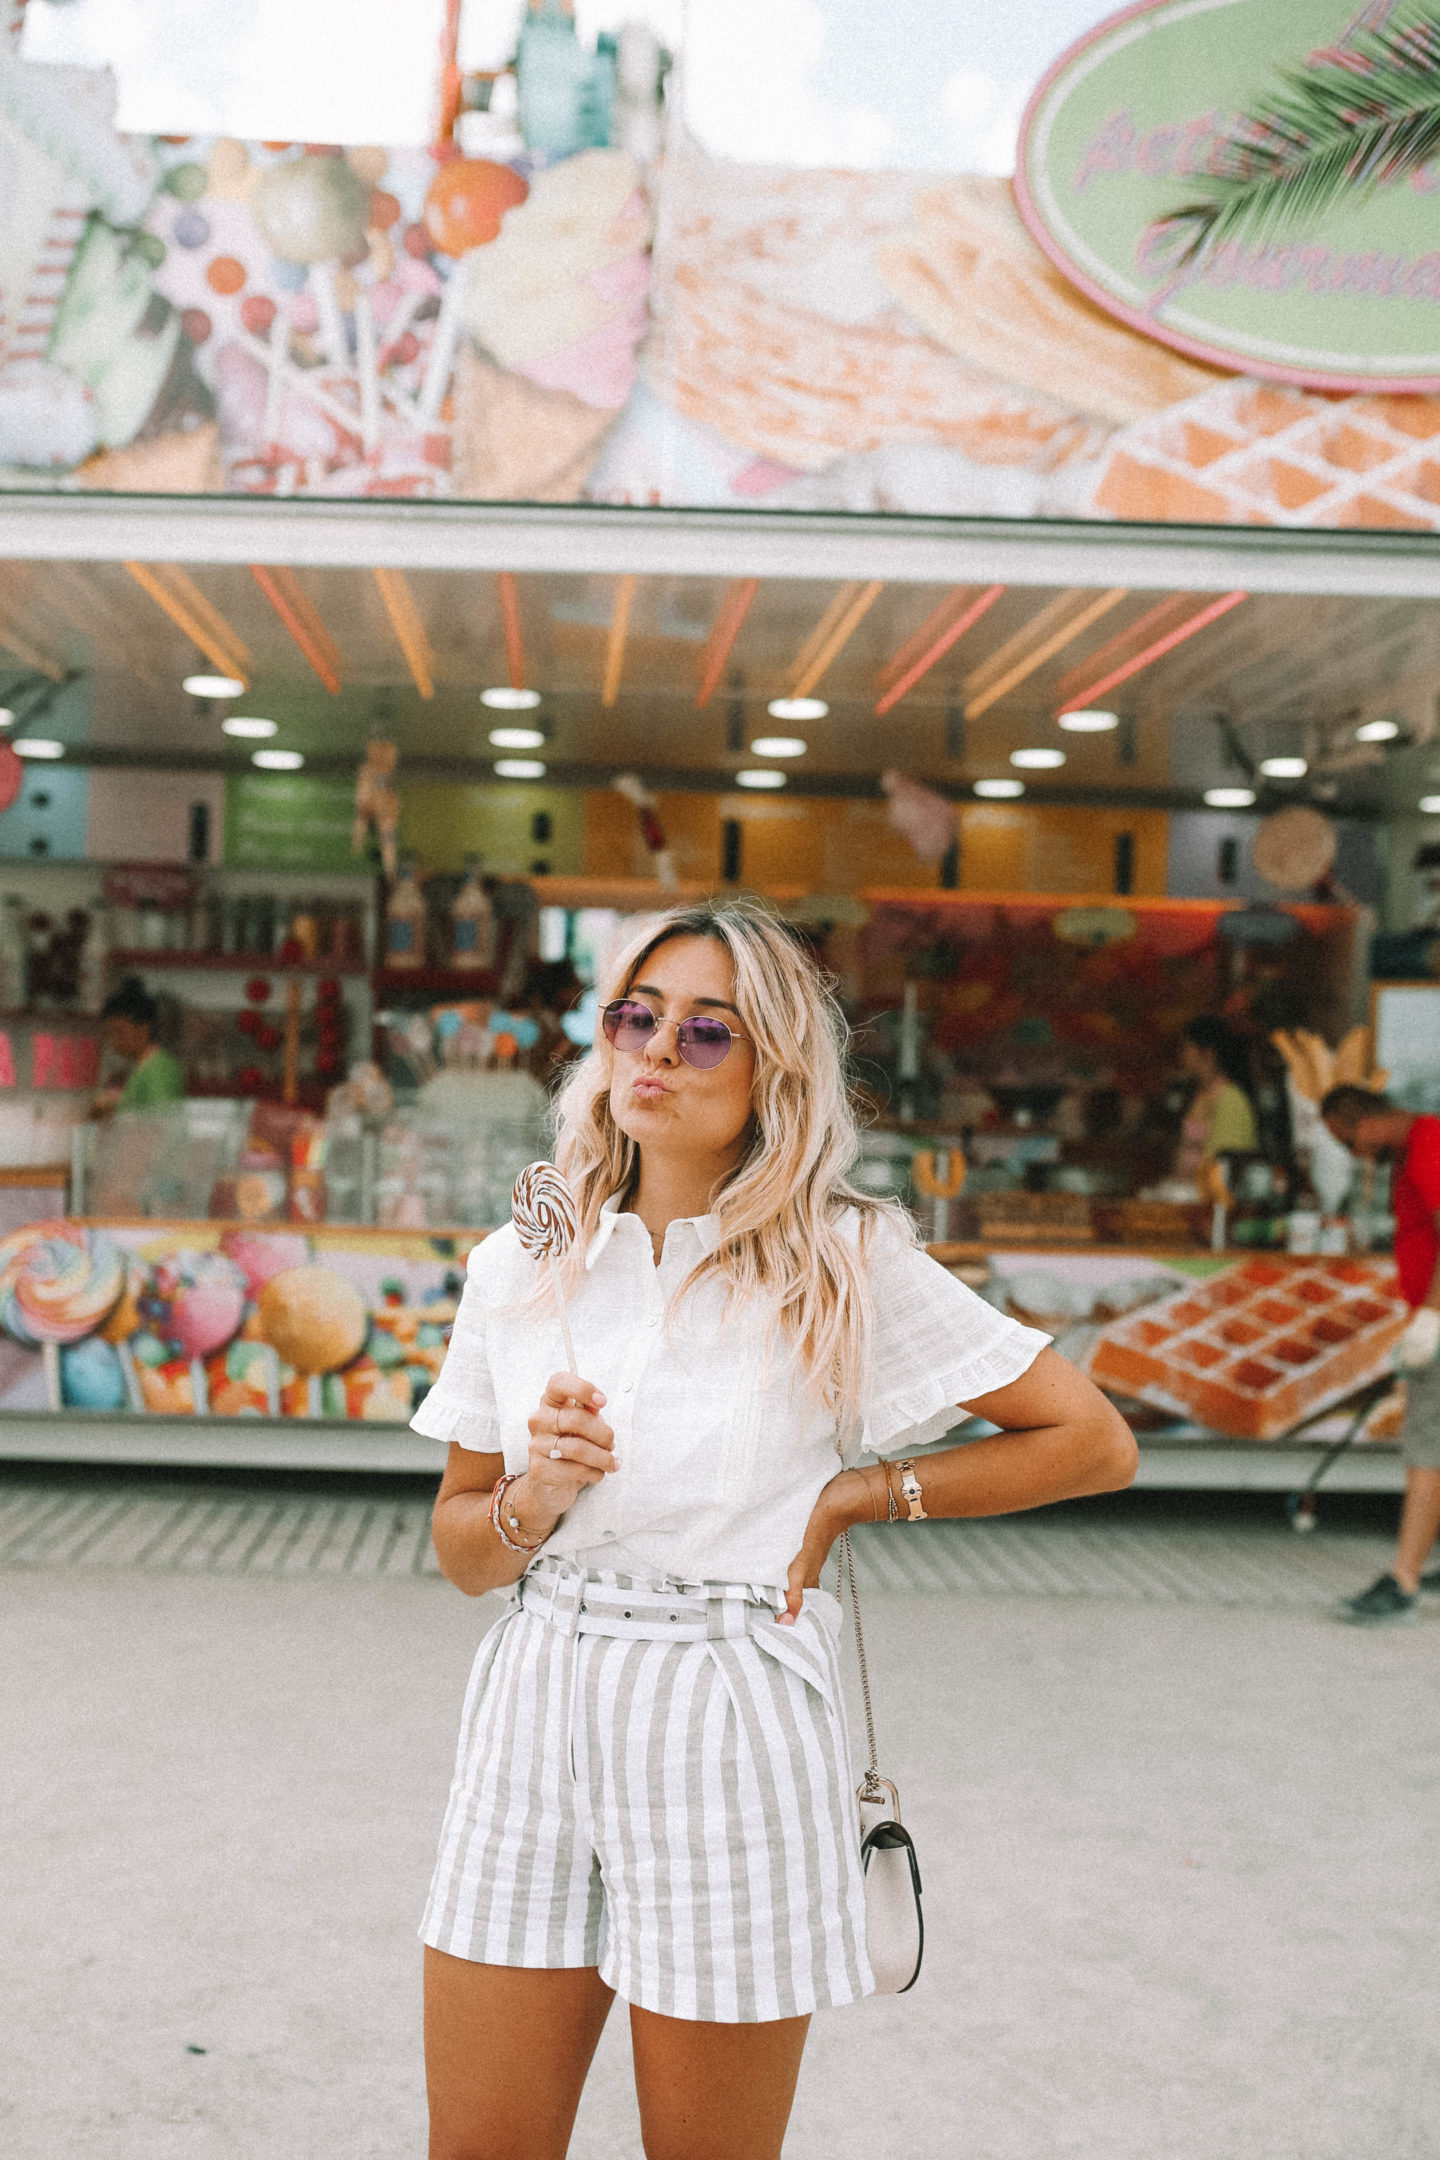 Visiter Paris - Blondie Baby blog mode et voyages Paris